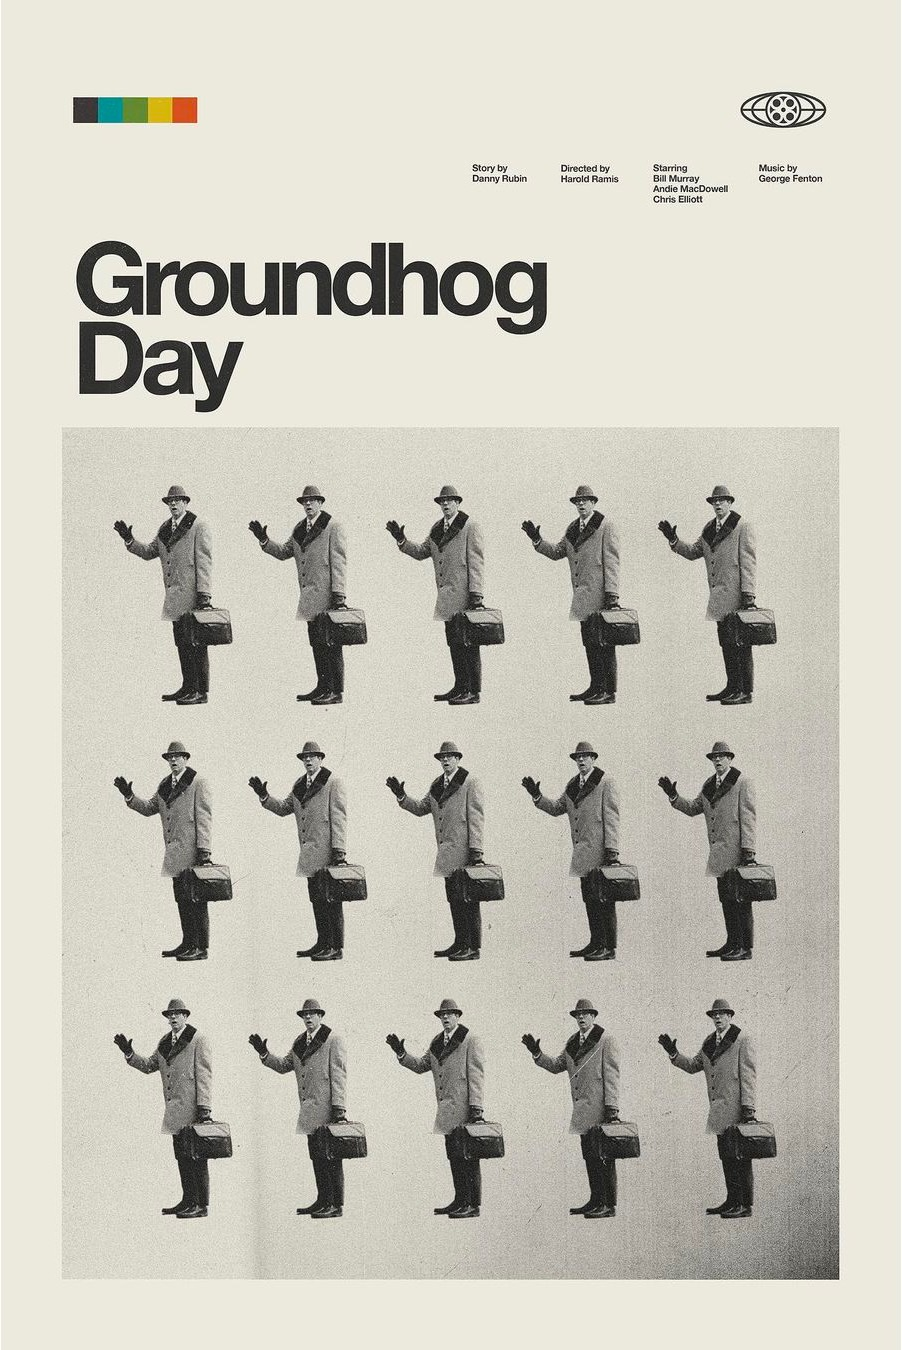 retro modern movie poster for Groundhog Day